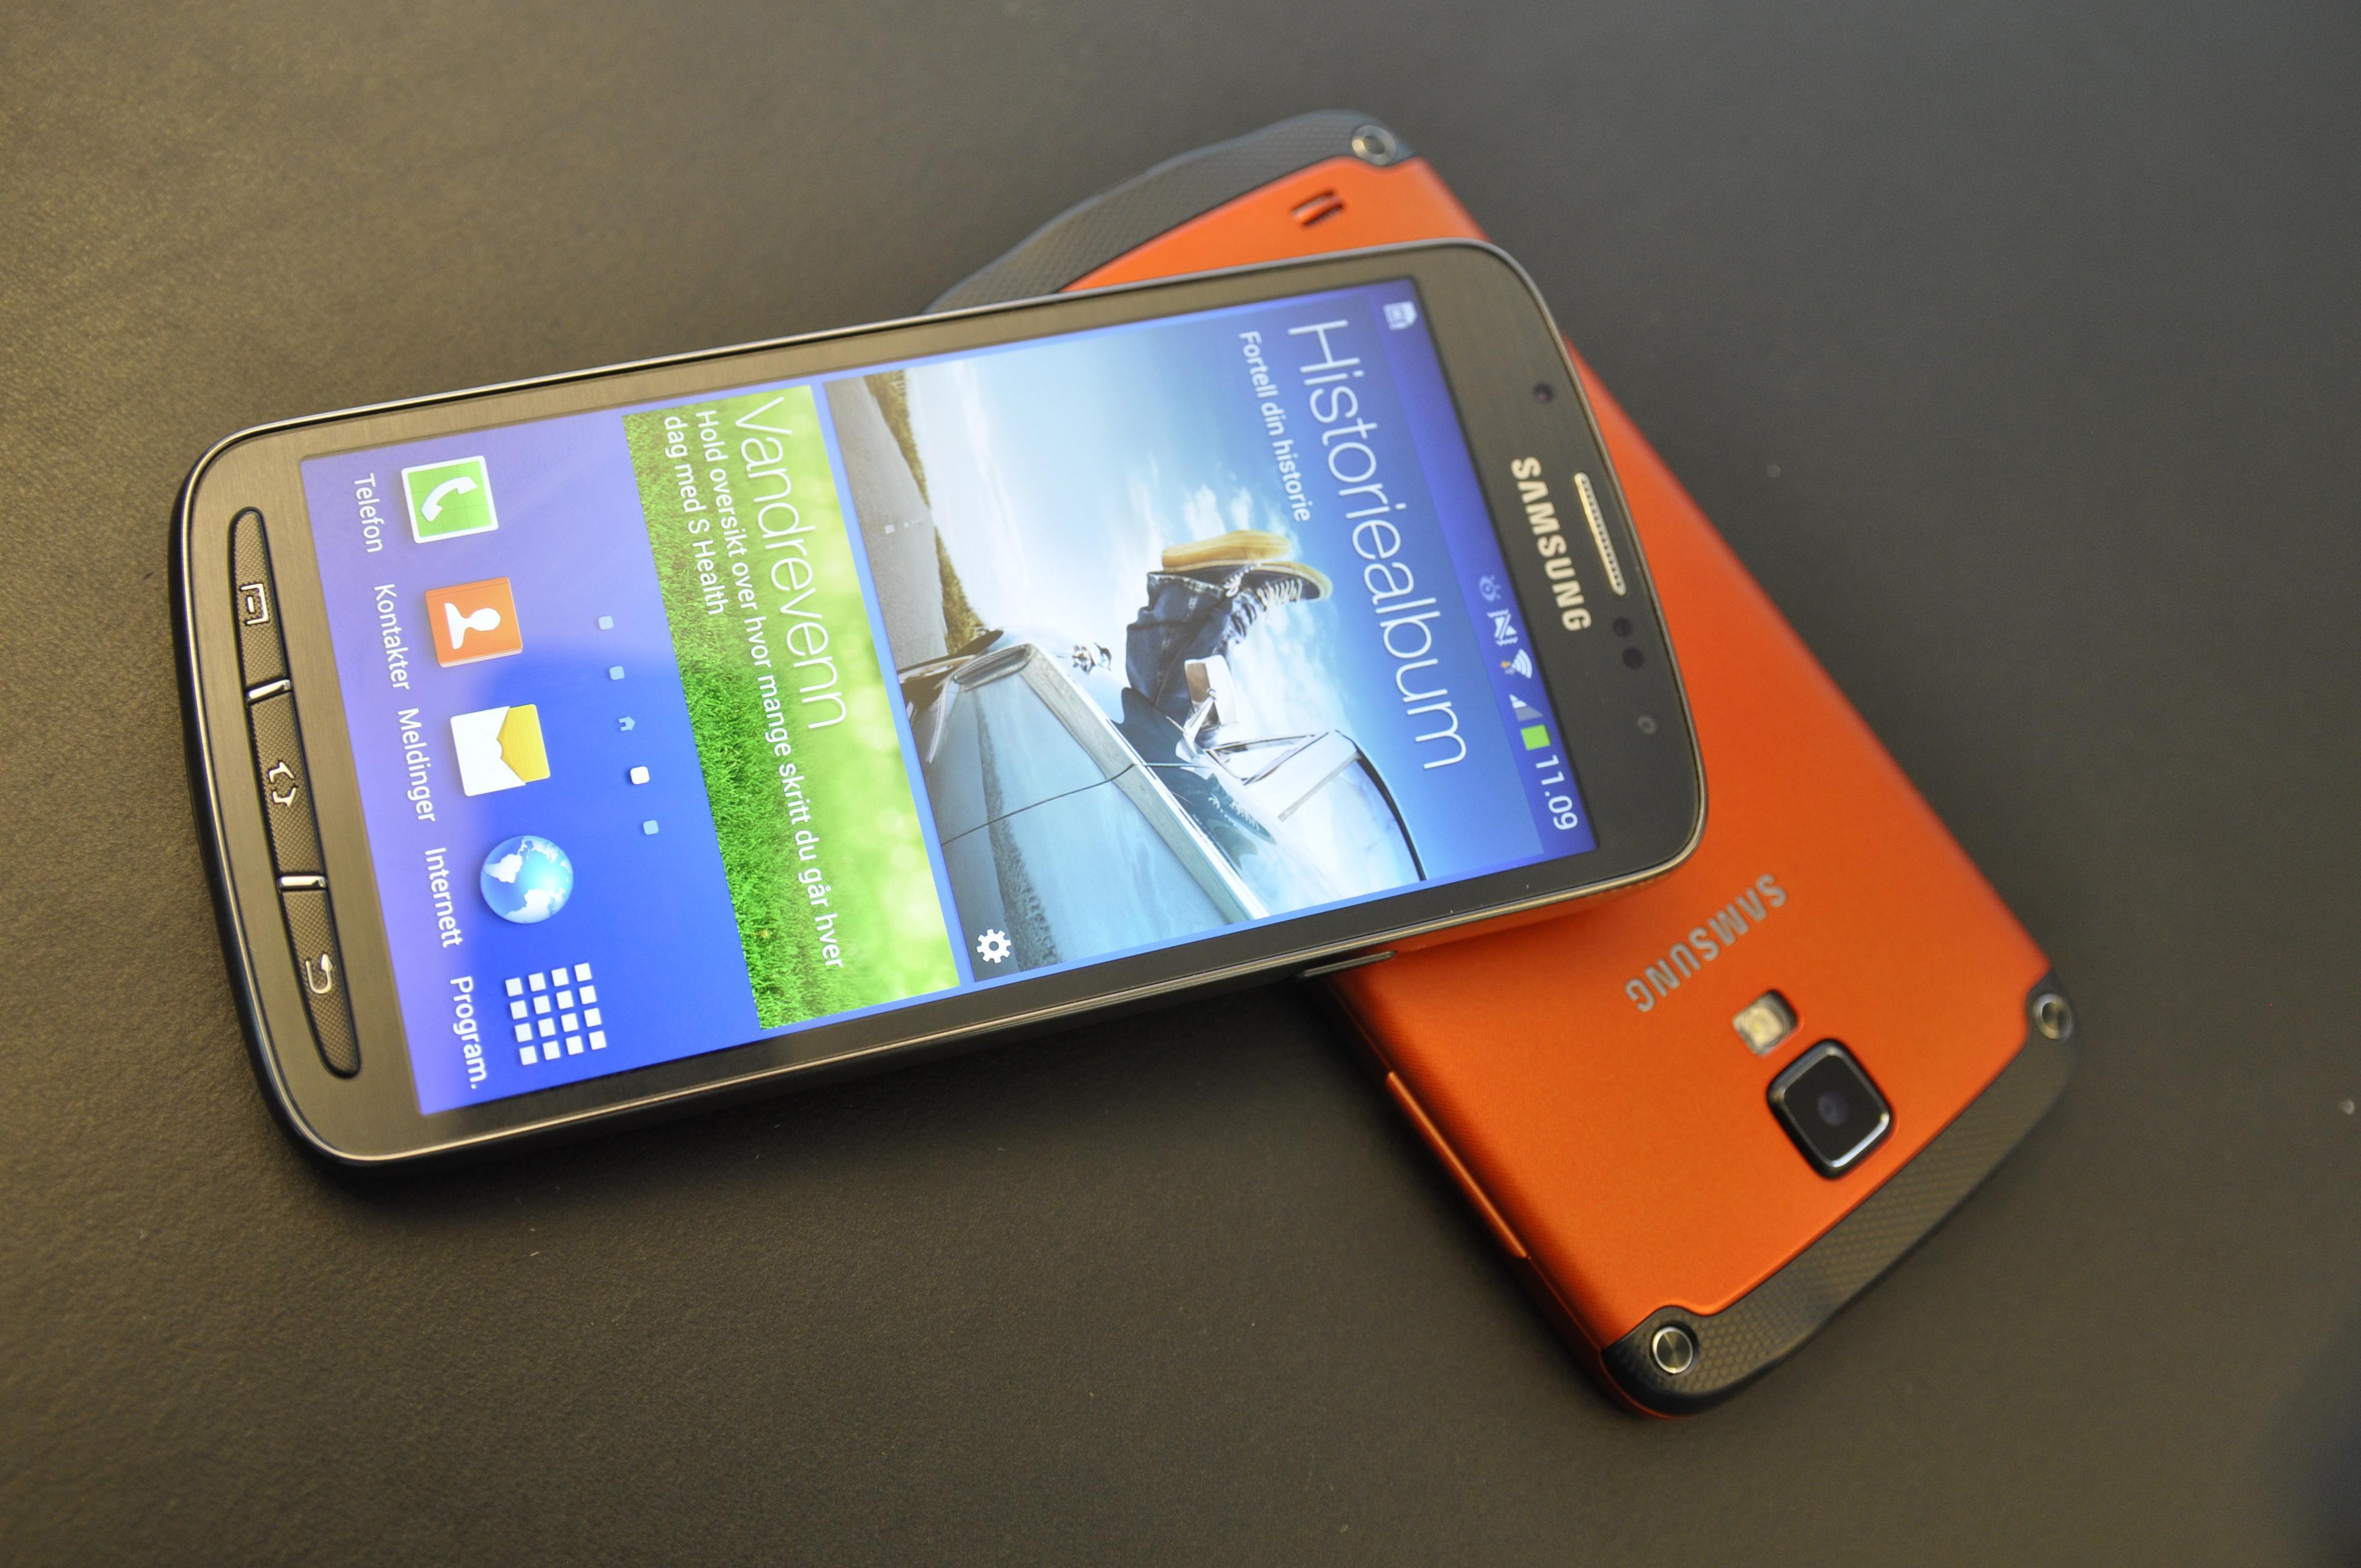 Samsung Galaxy S4 Active.Foto: Finn Jarle Kvalheim, Amobil.no